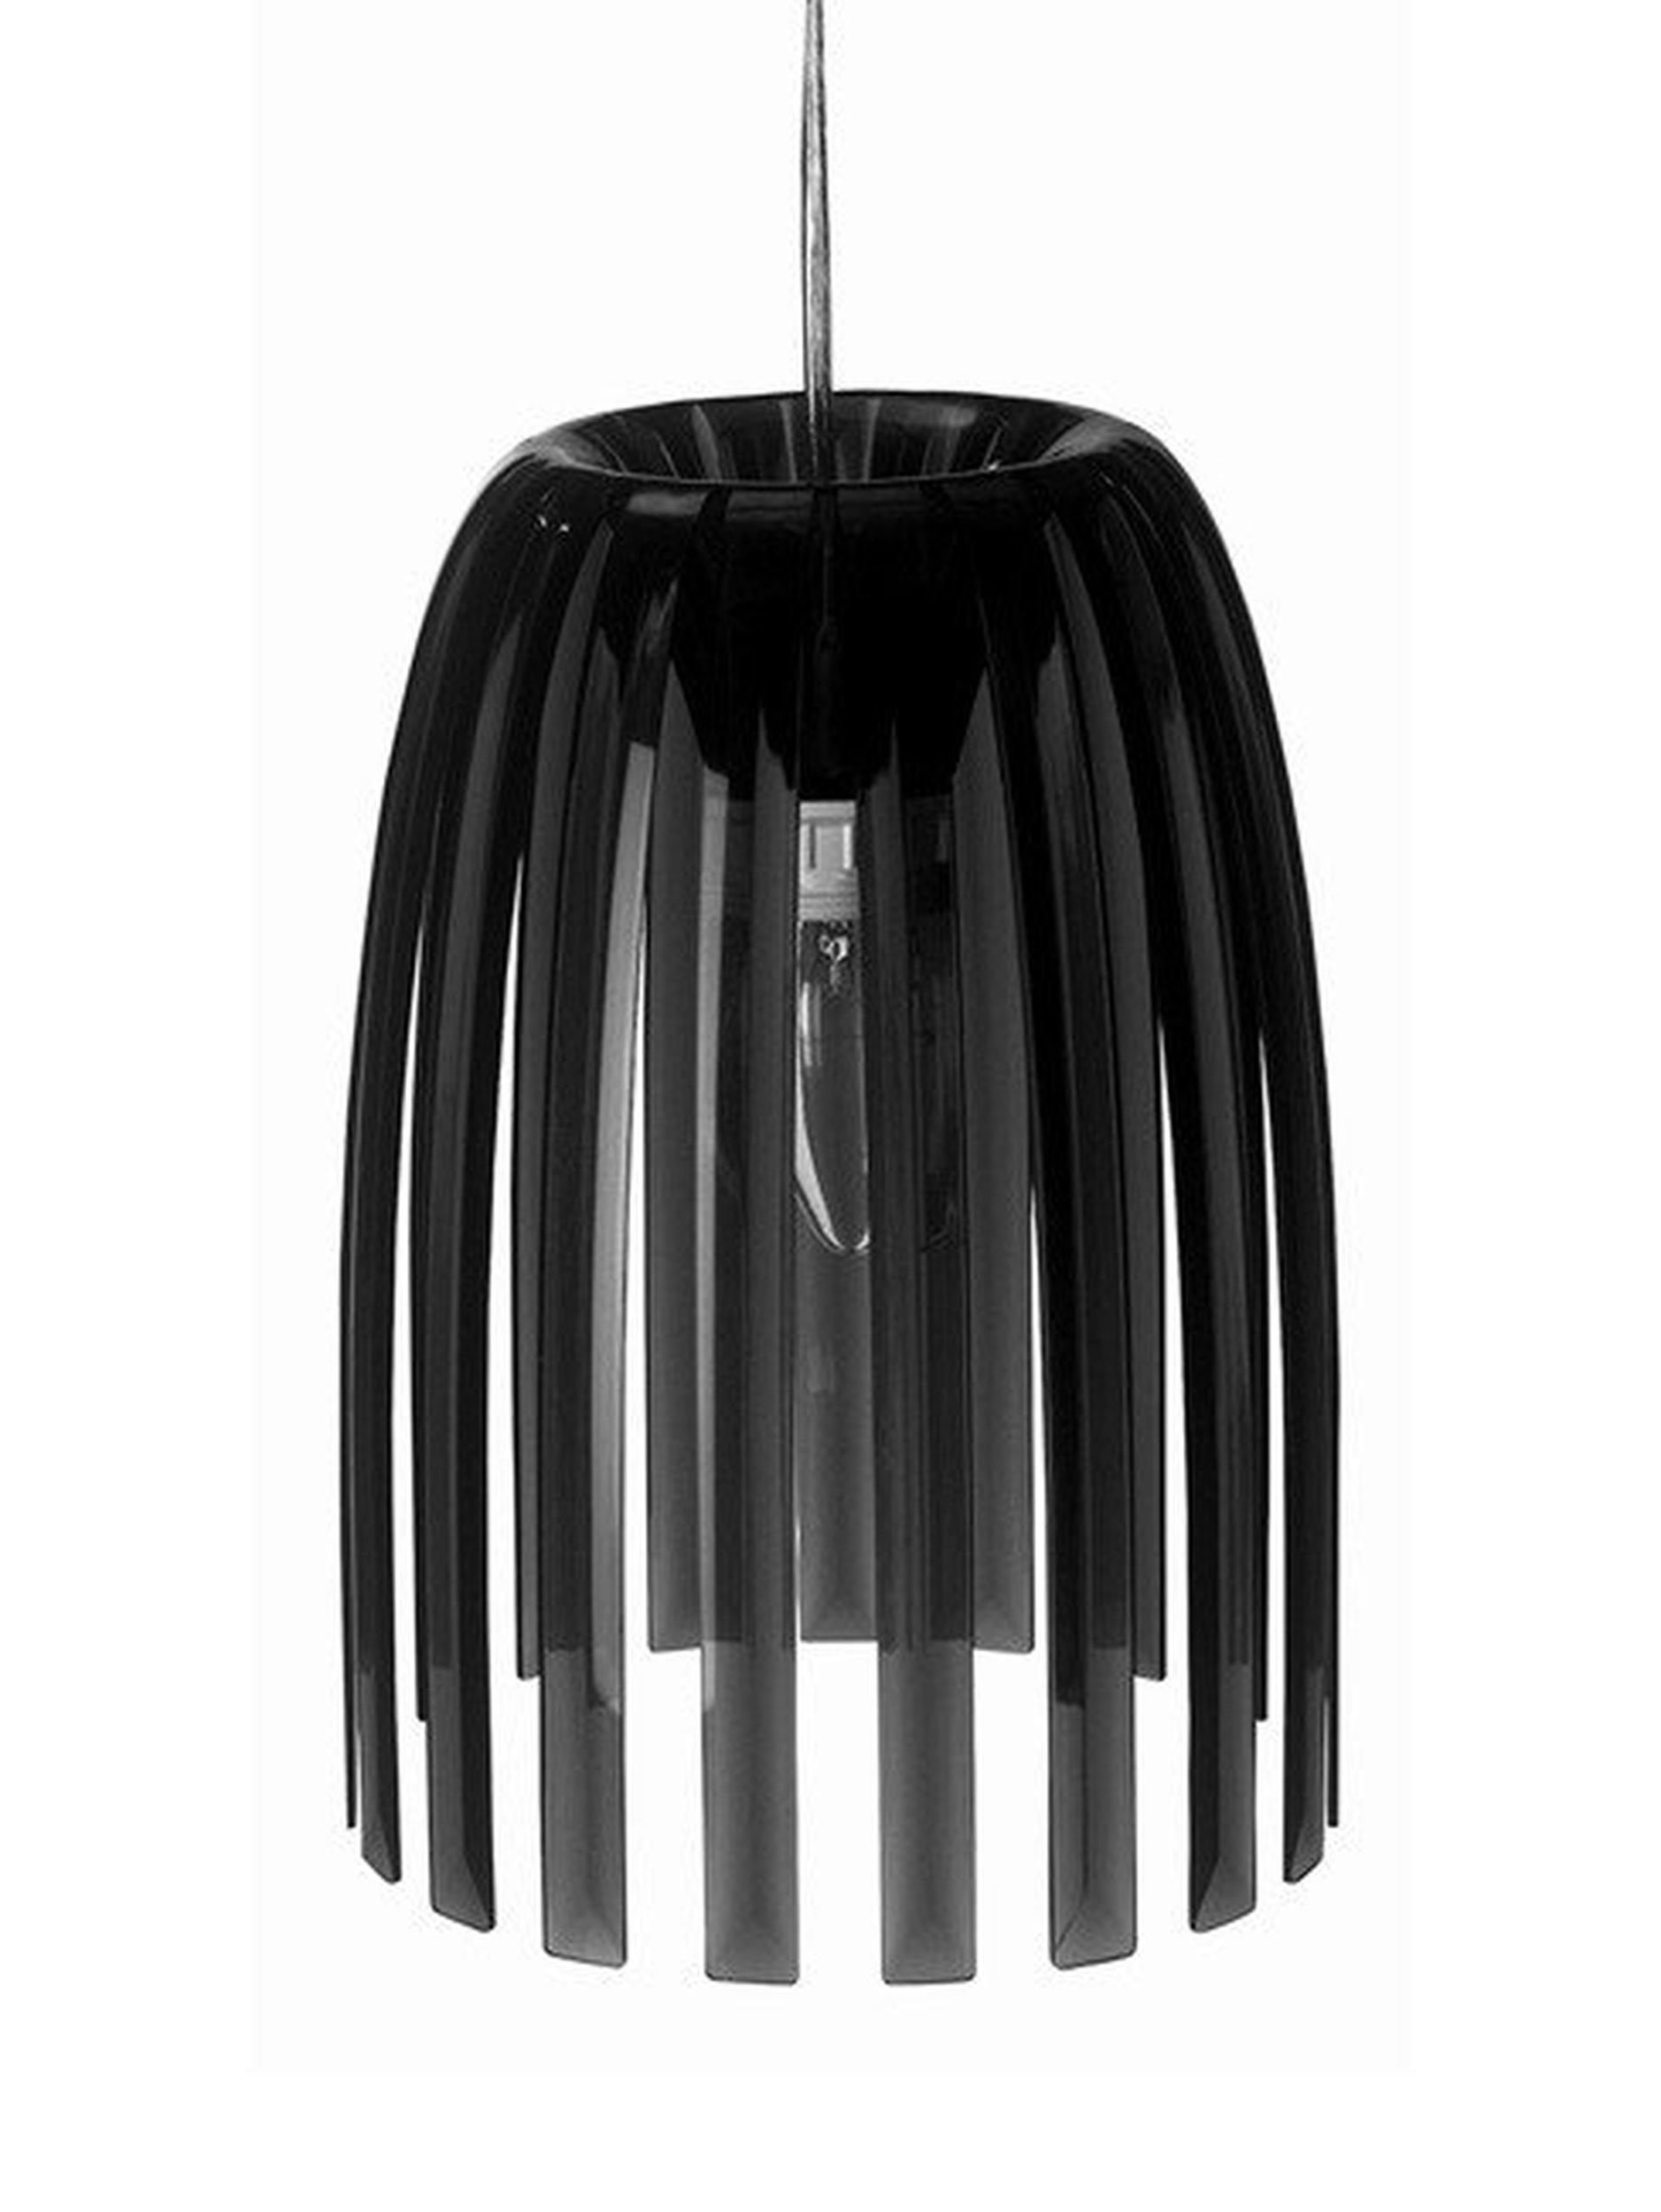 Lampa Josephine S czarna